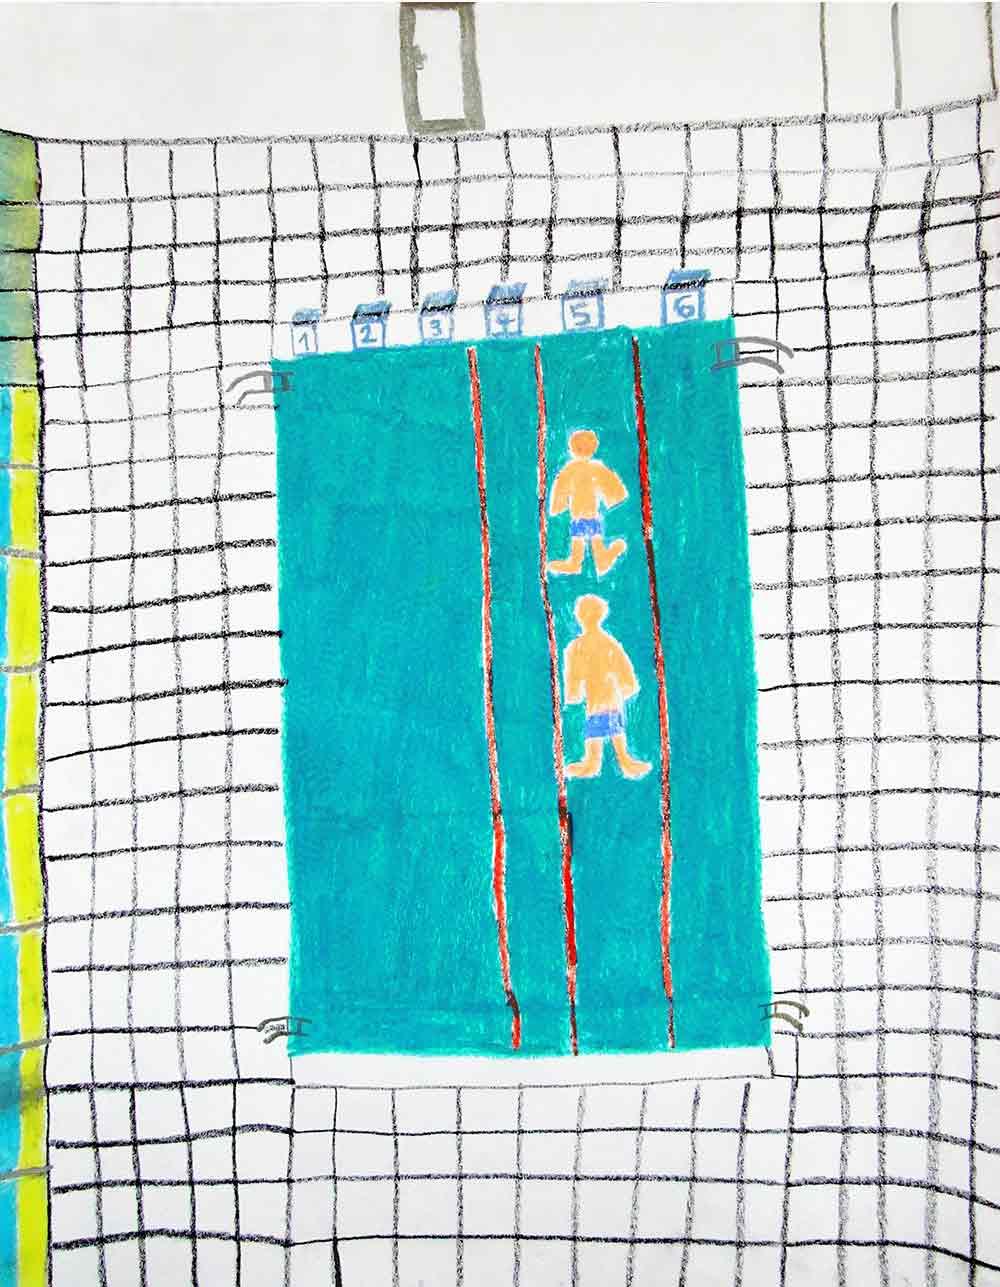 Guillaume Chocu. Piscine avec Nicolas, 2016, pastel gras. EgArt. Fonds Art Sans Exclusion